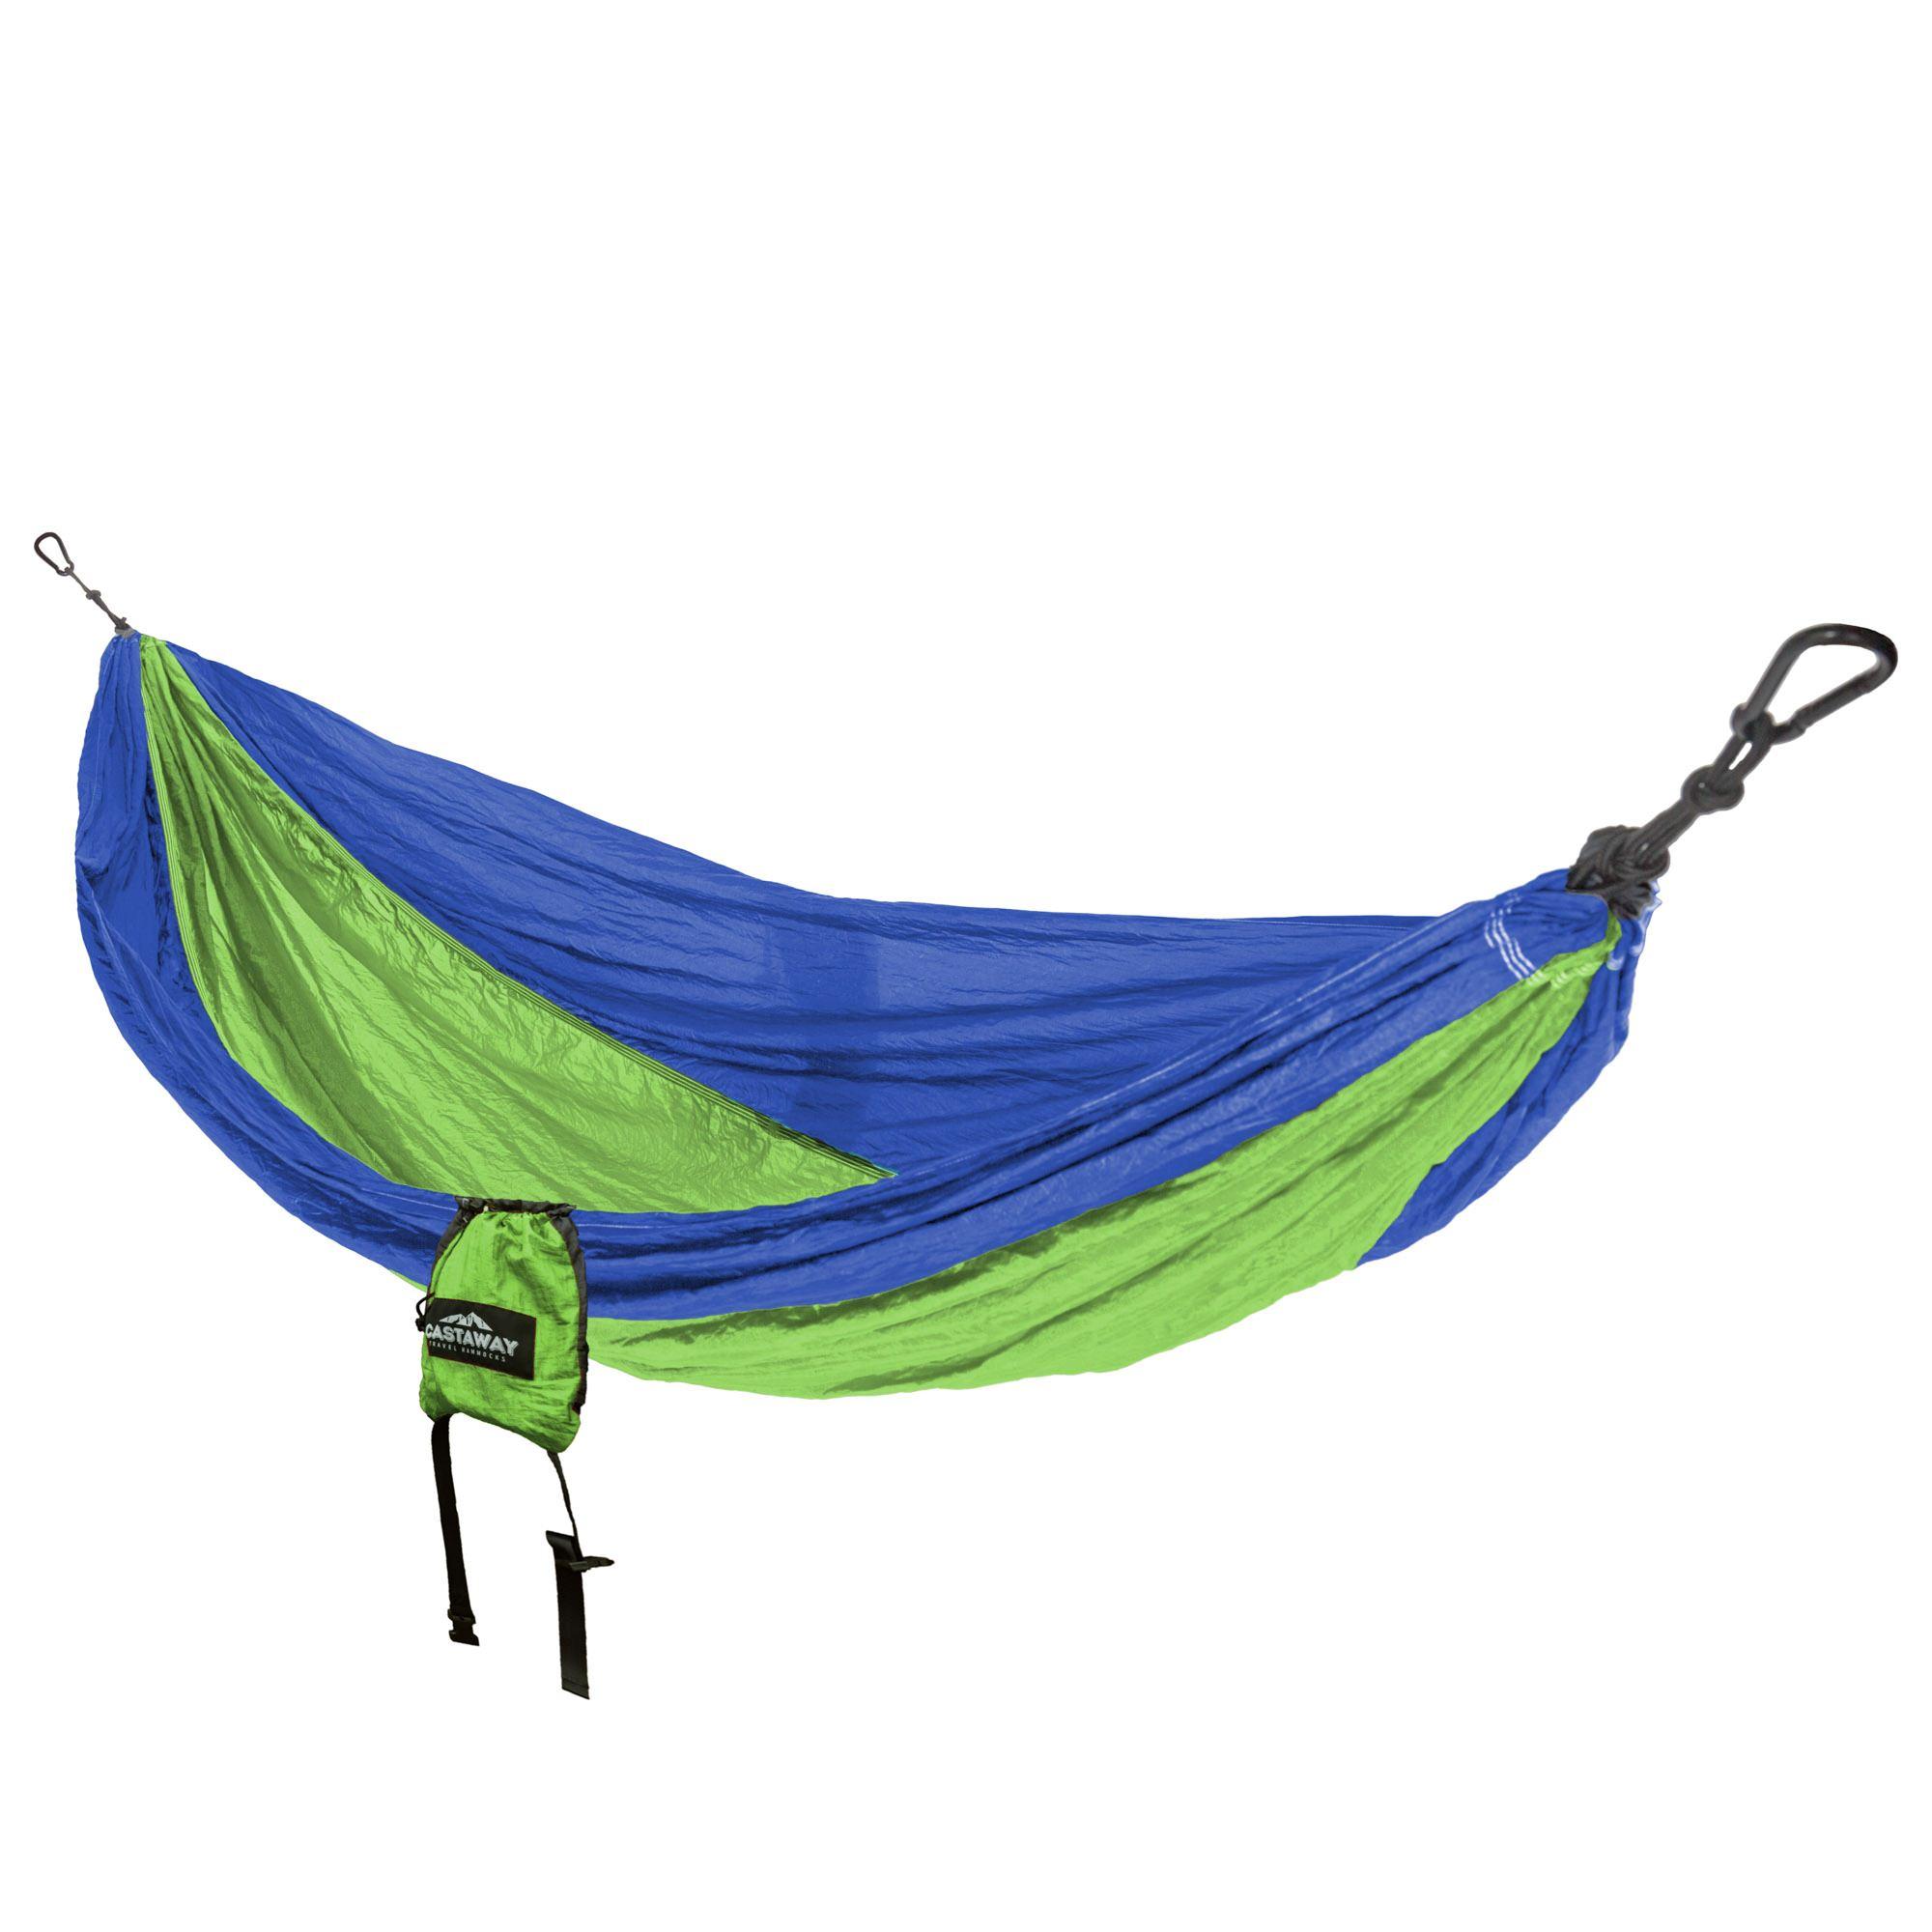 emerald pinterest pin khakis khaki hammocks singlenest travel shoot hammock photo